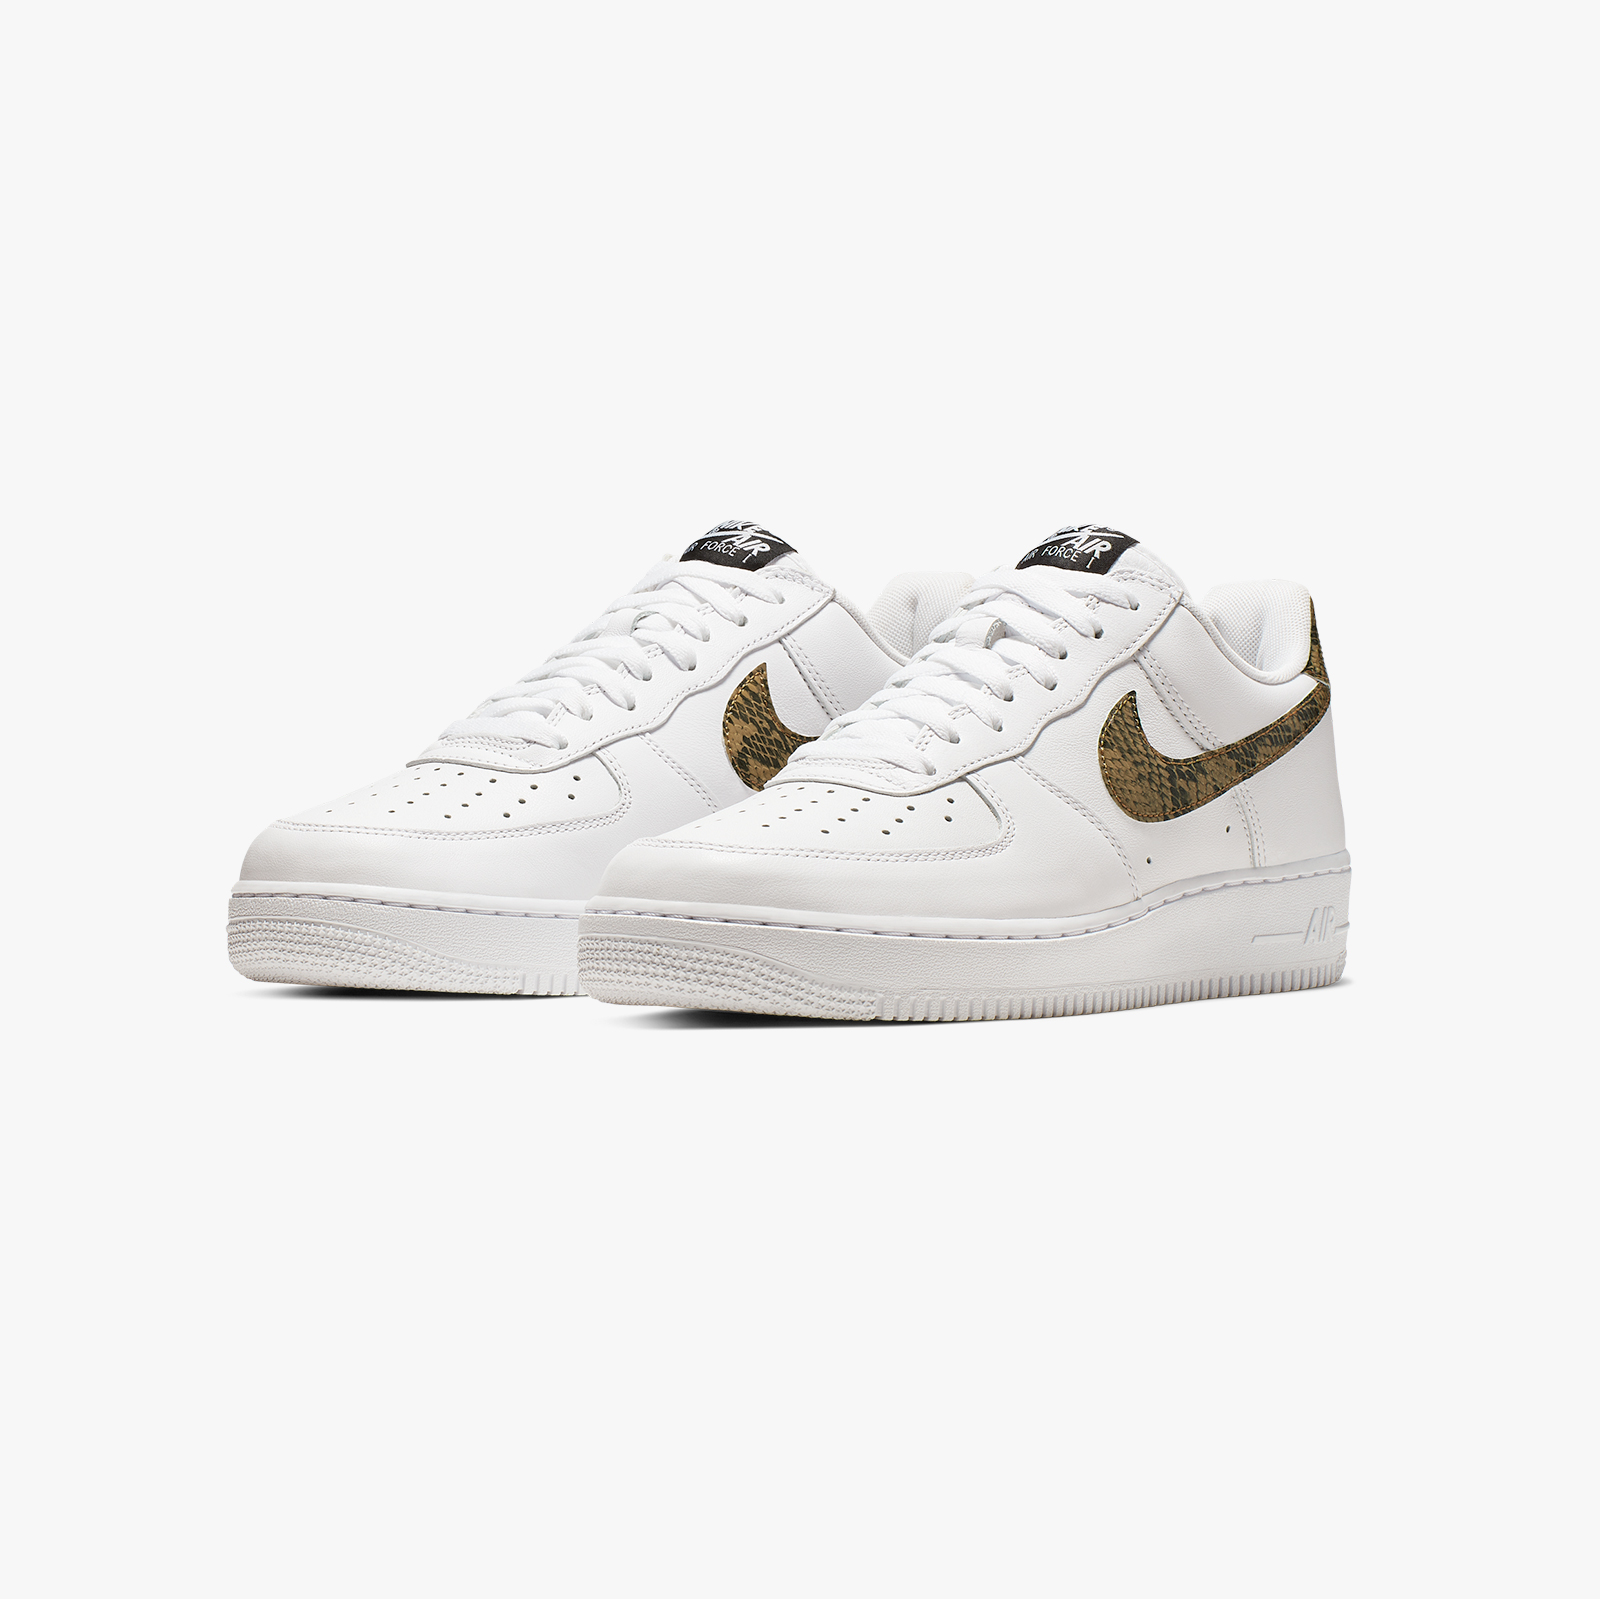 Nike Air Force 1 Low Retro Premium QS